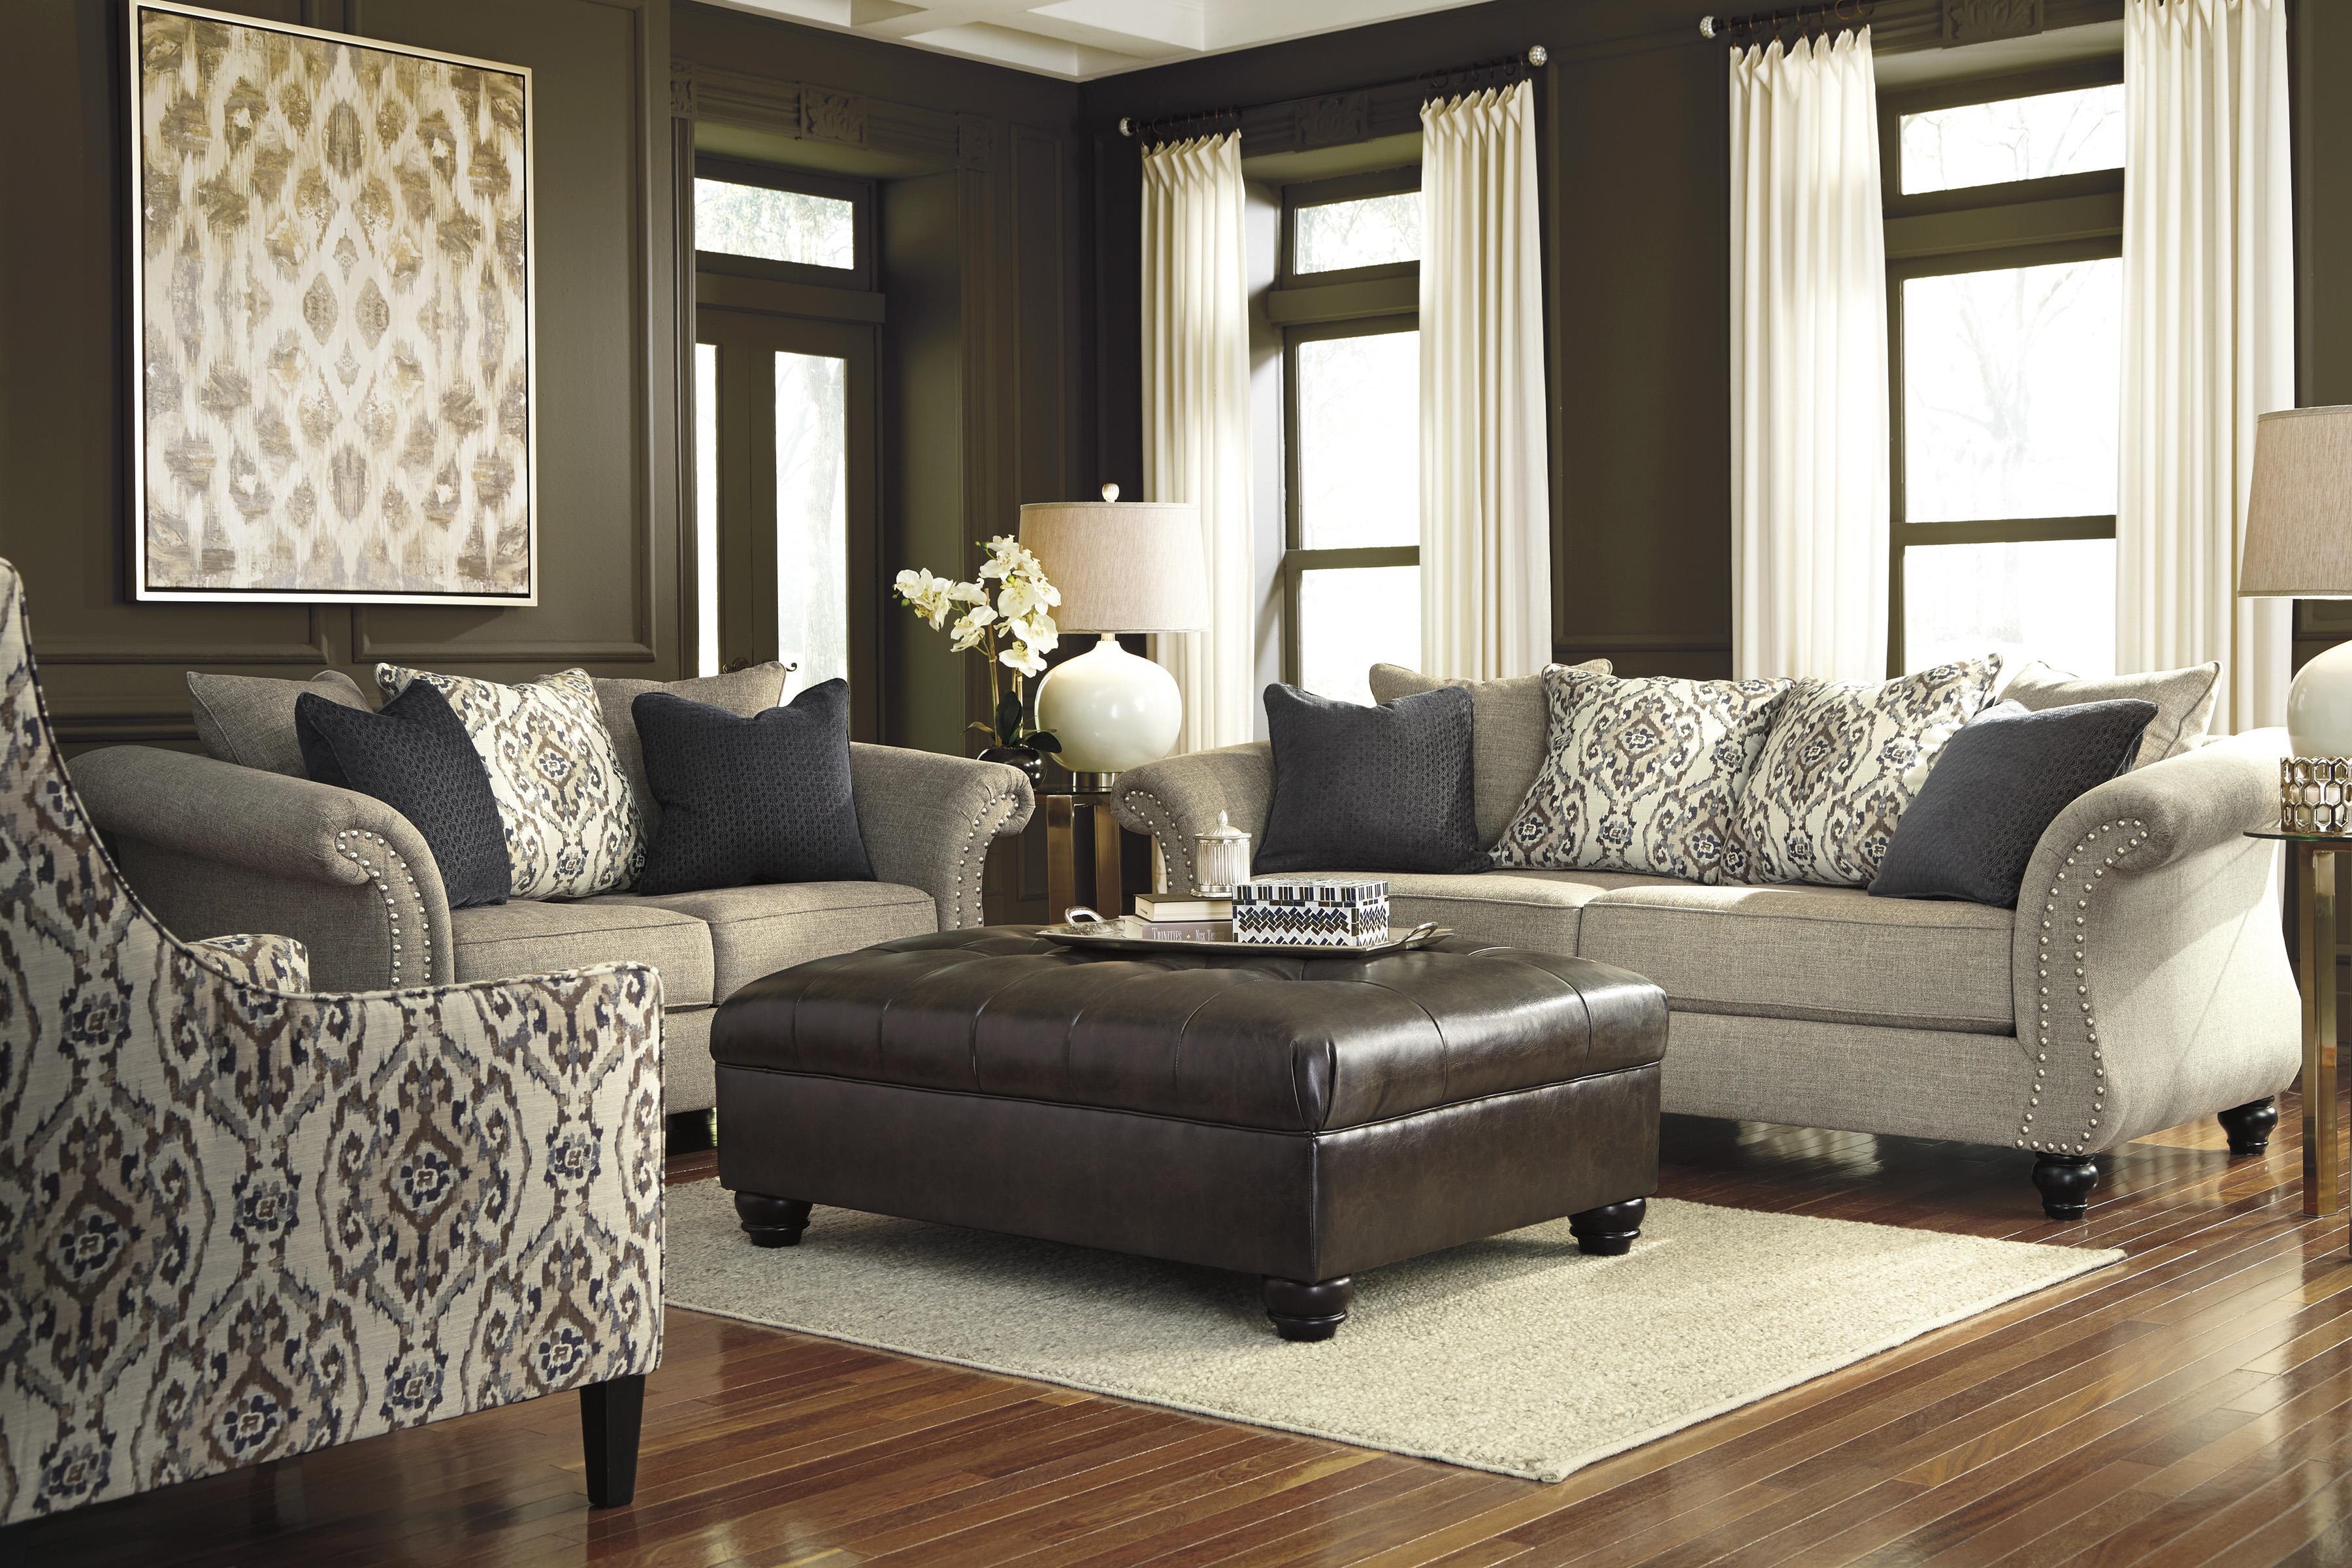 Ashley/Benchcraft Jonette Stationary Living Room Group - Item Number: 46101 Living Room Group 4